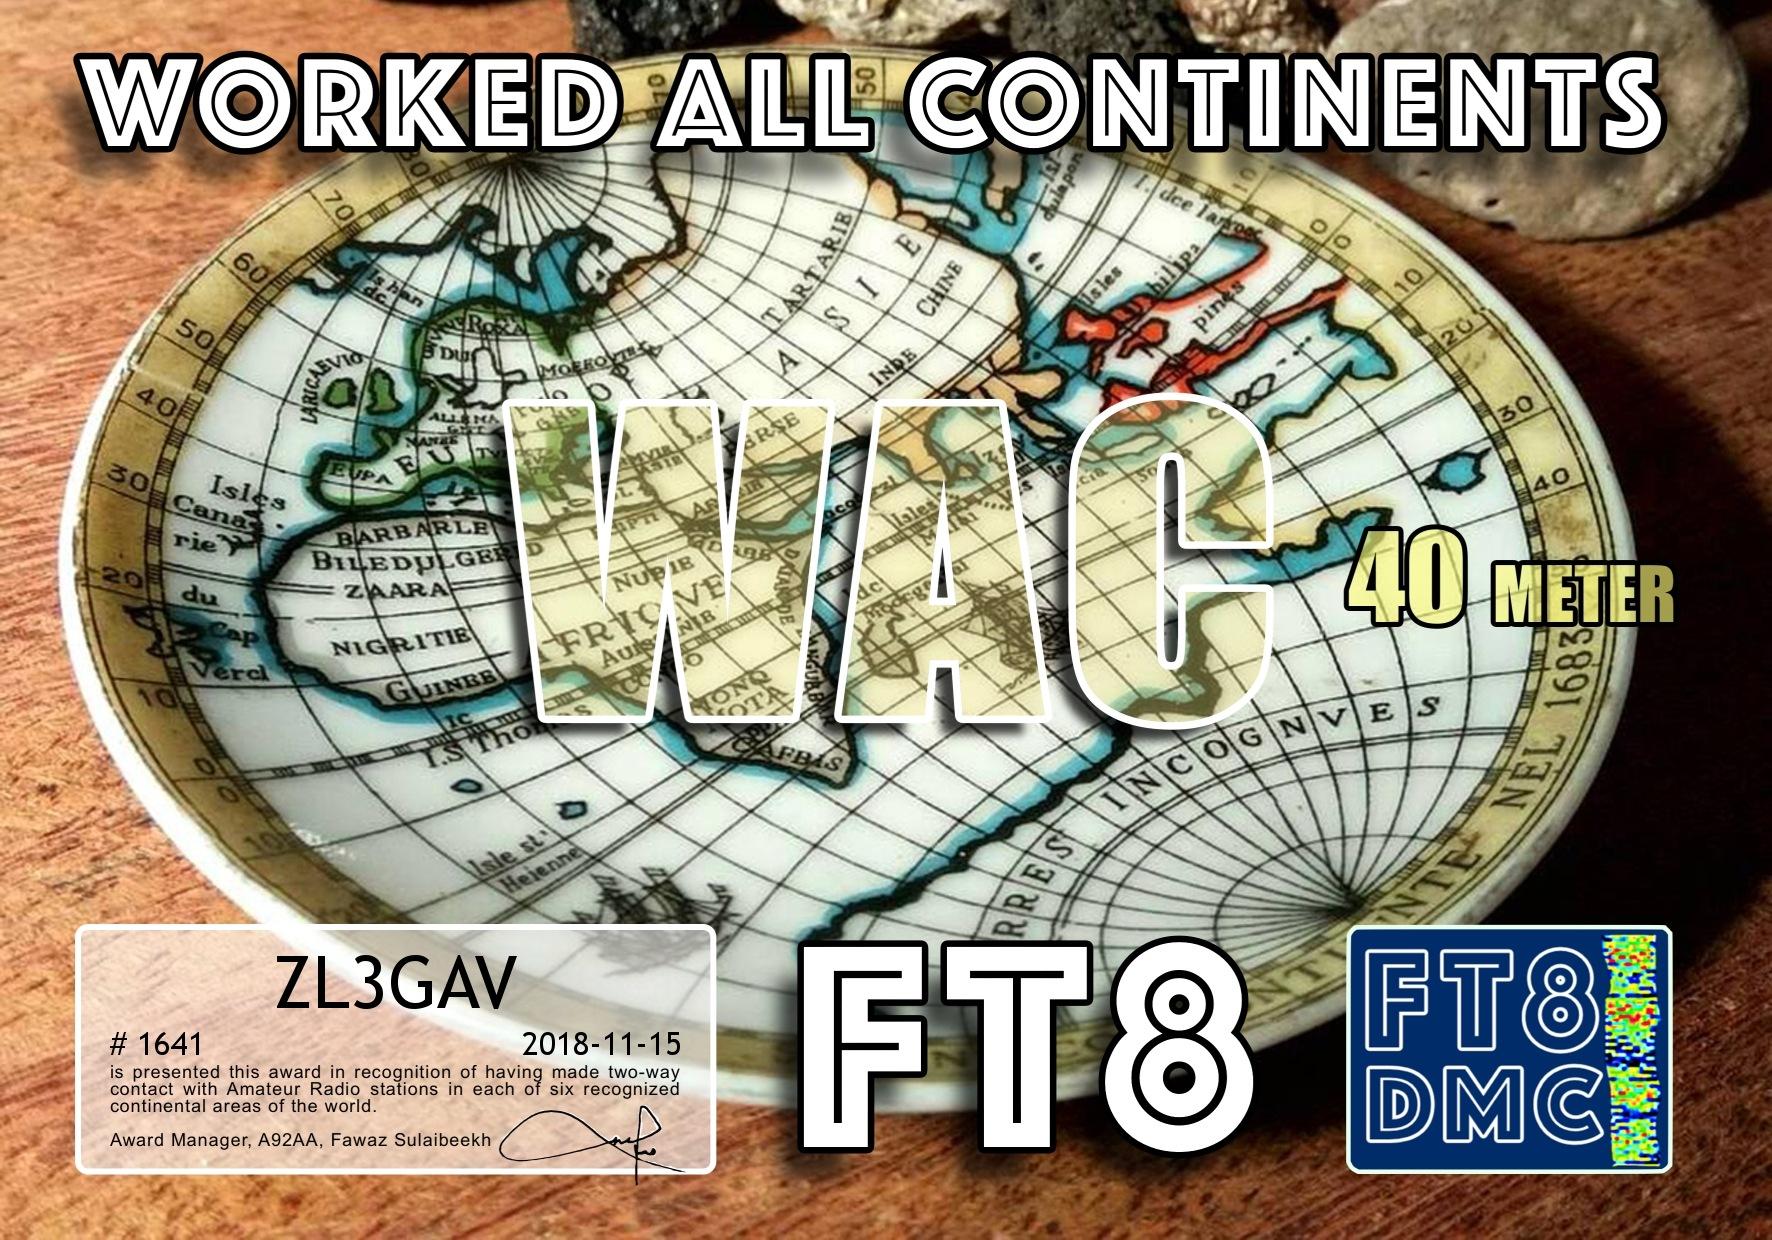 ZL3GAV-WAC-40M.jpg